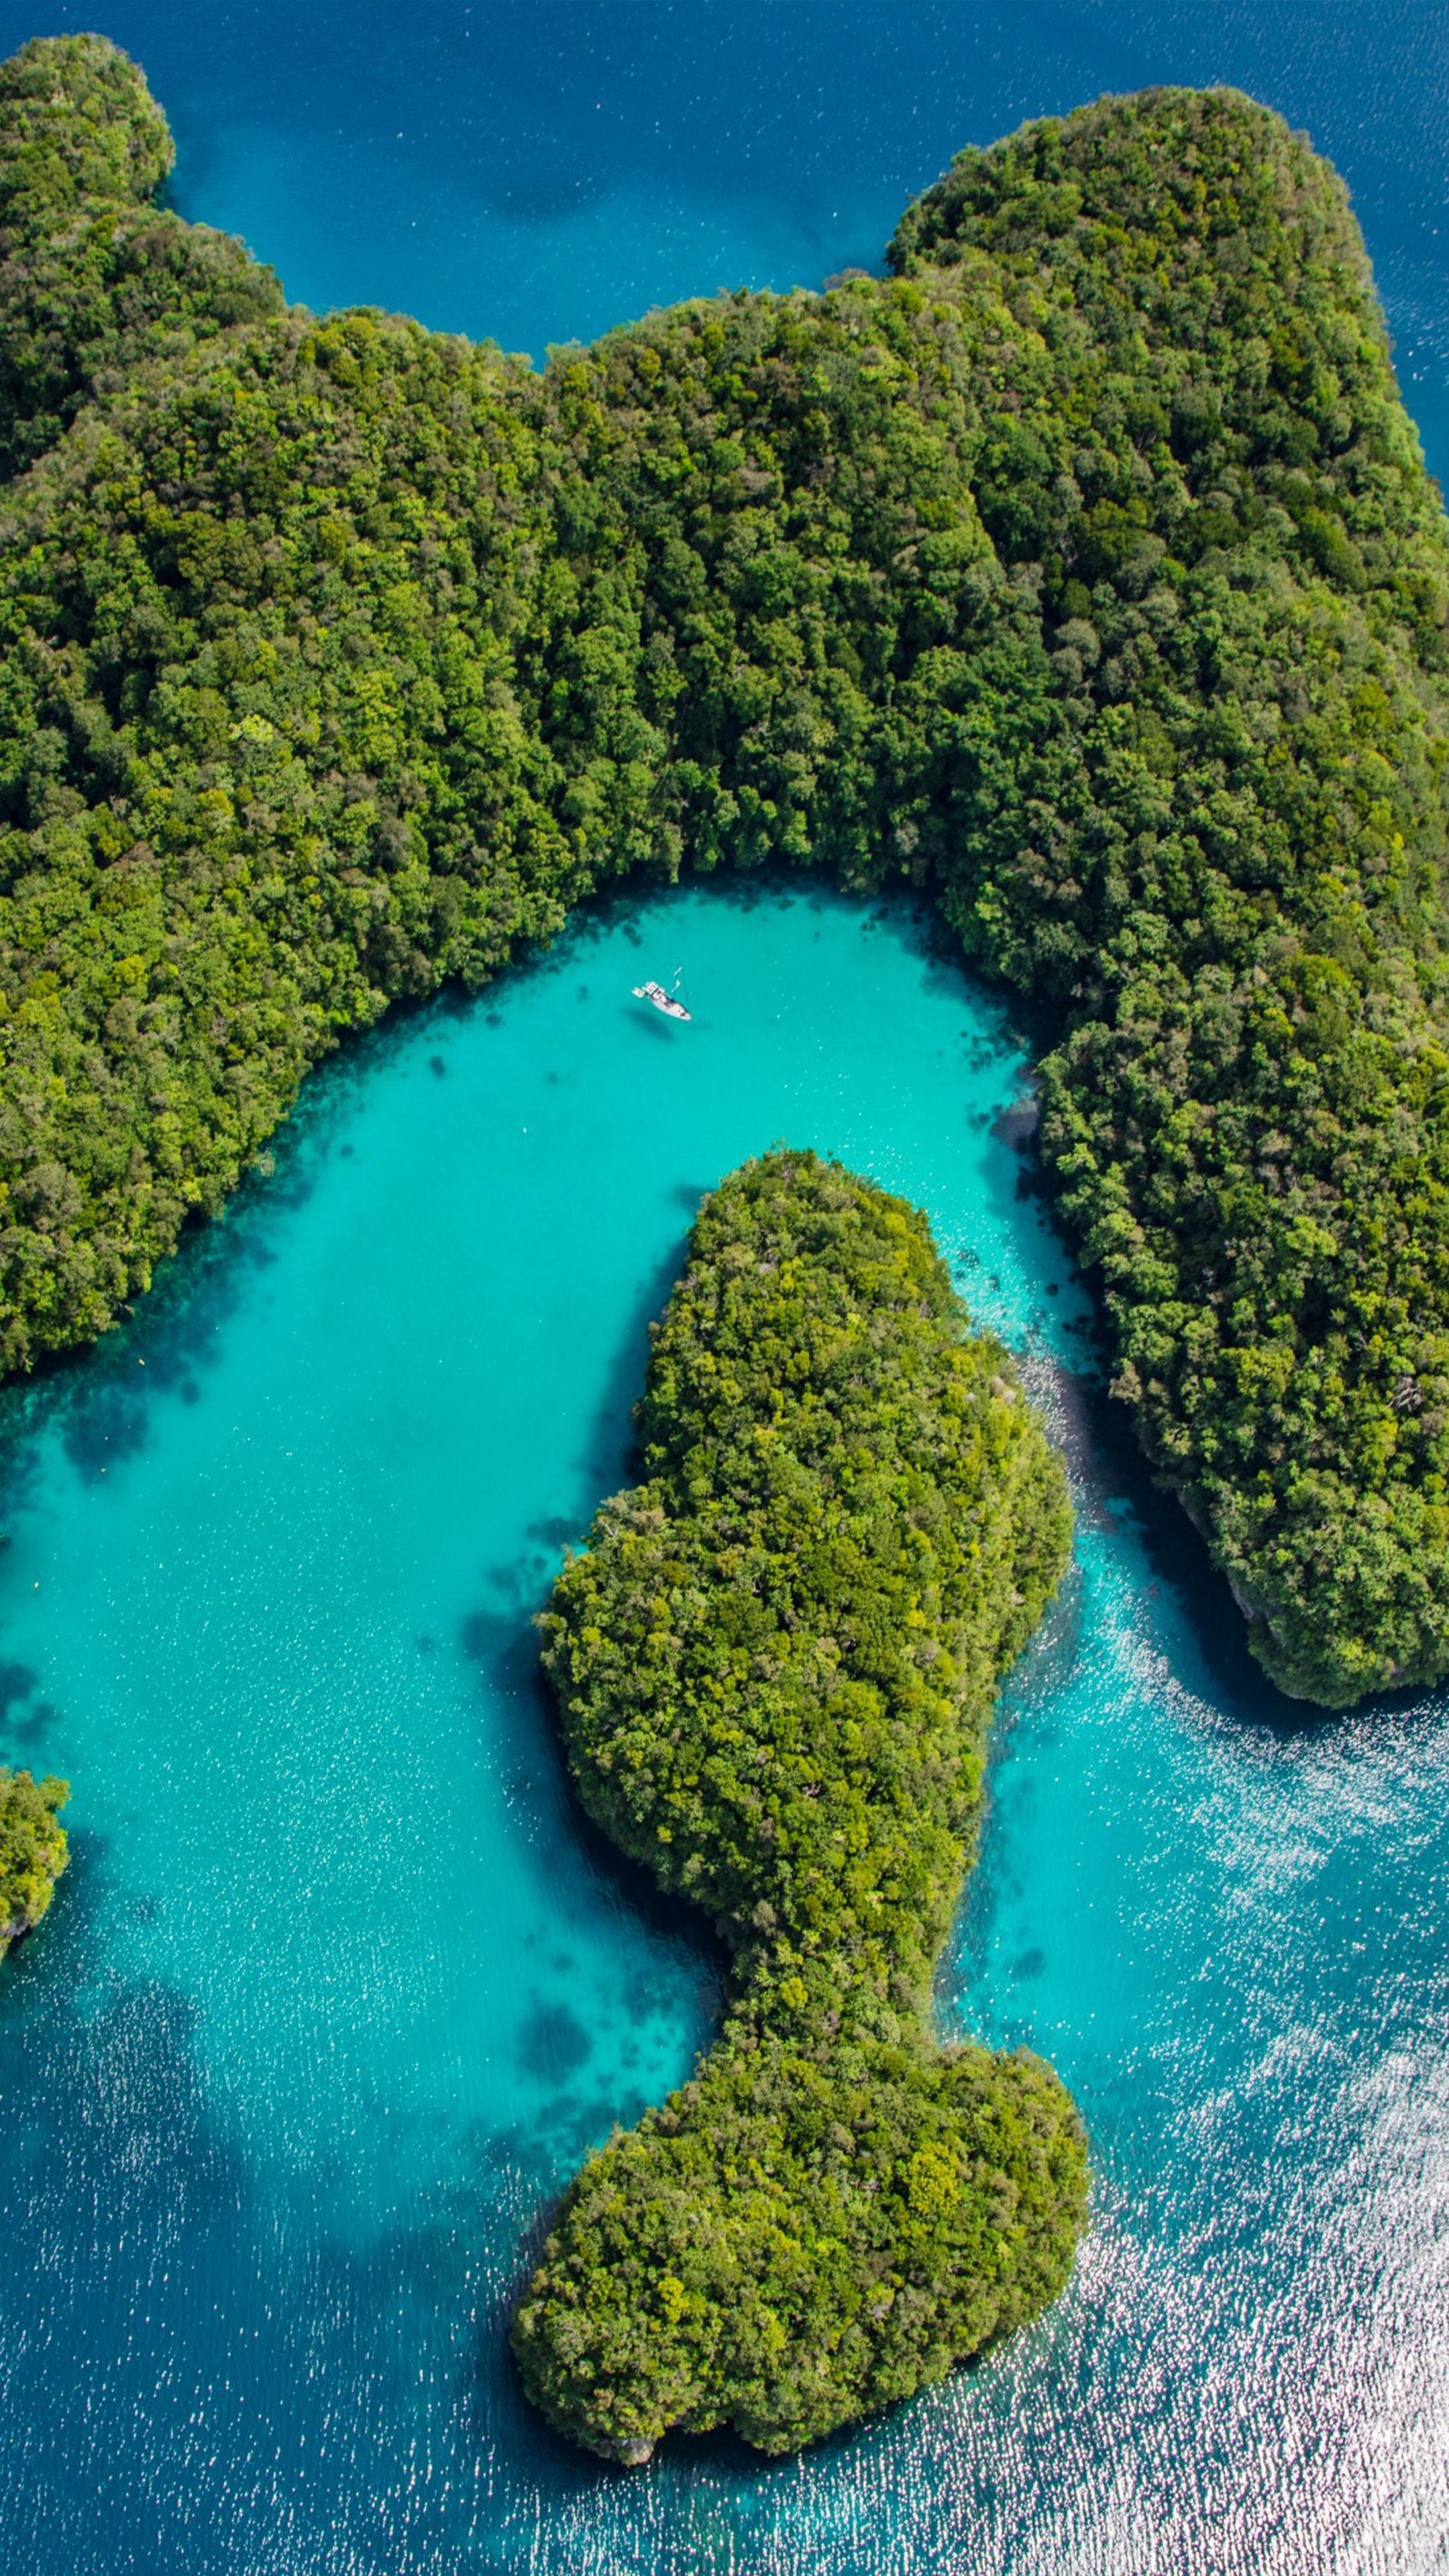 Palau Islands Philippines Ocean Free 4k Ultra Hd Mobile Wallpaper